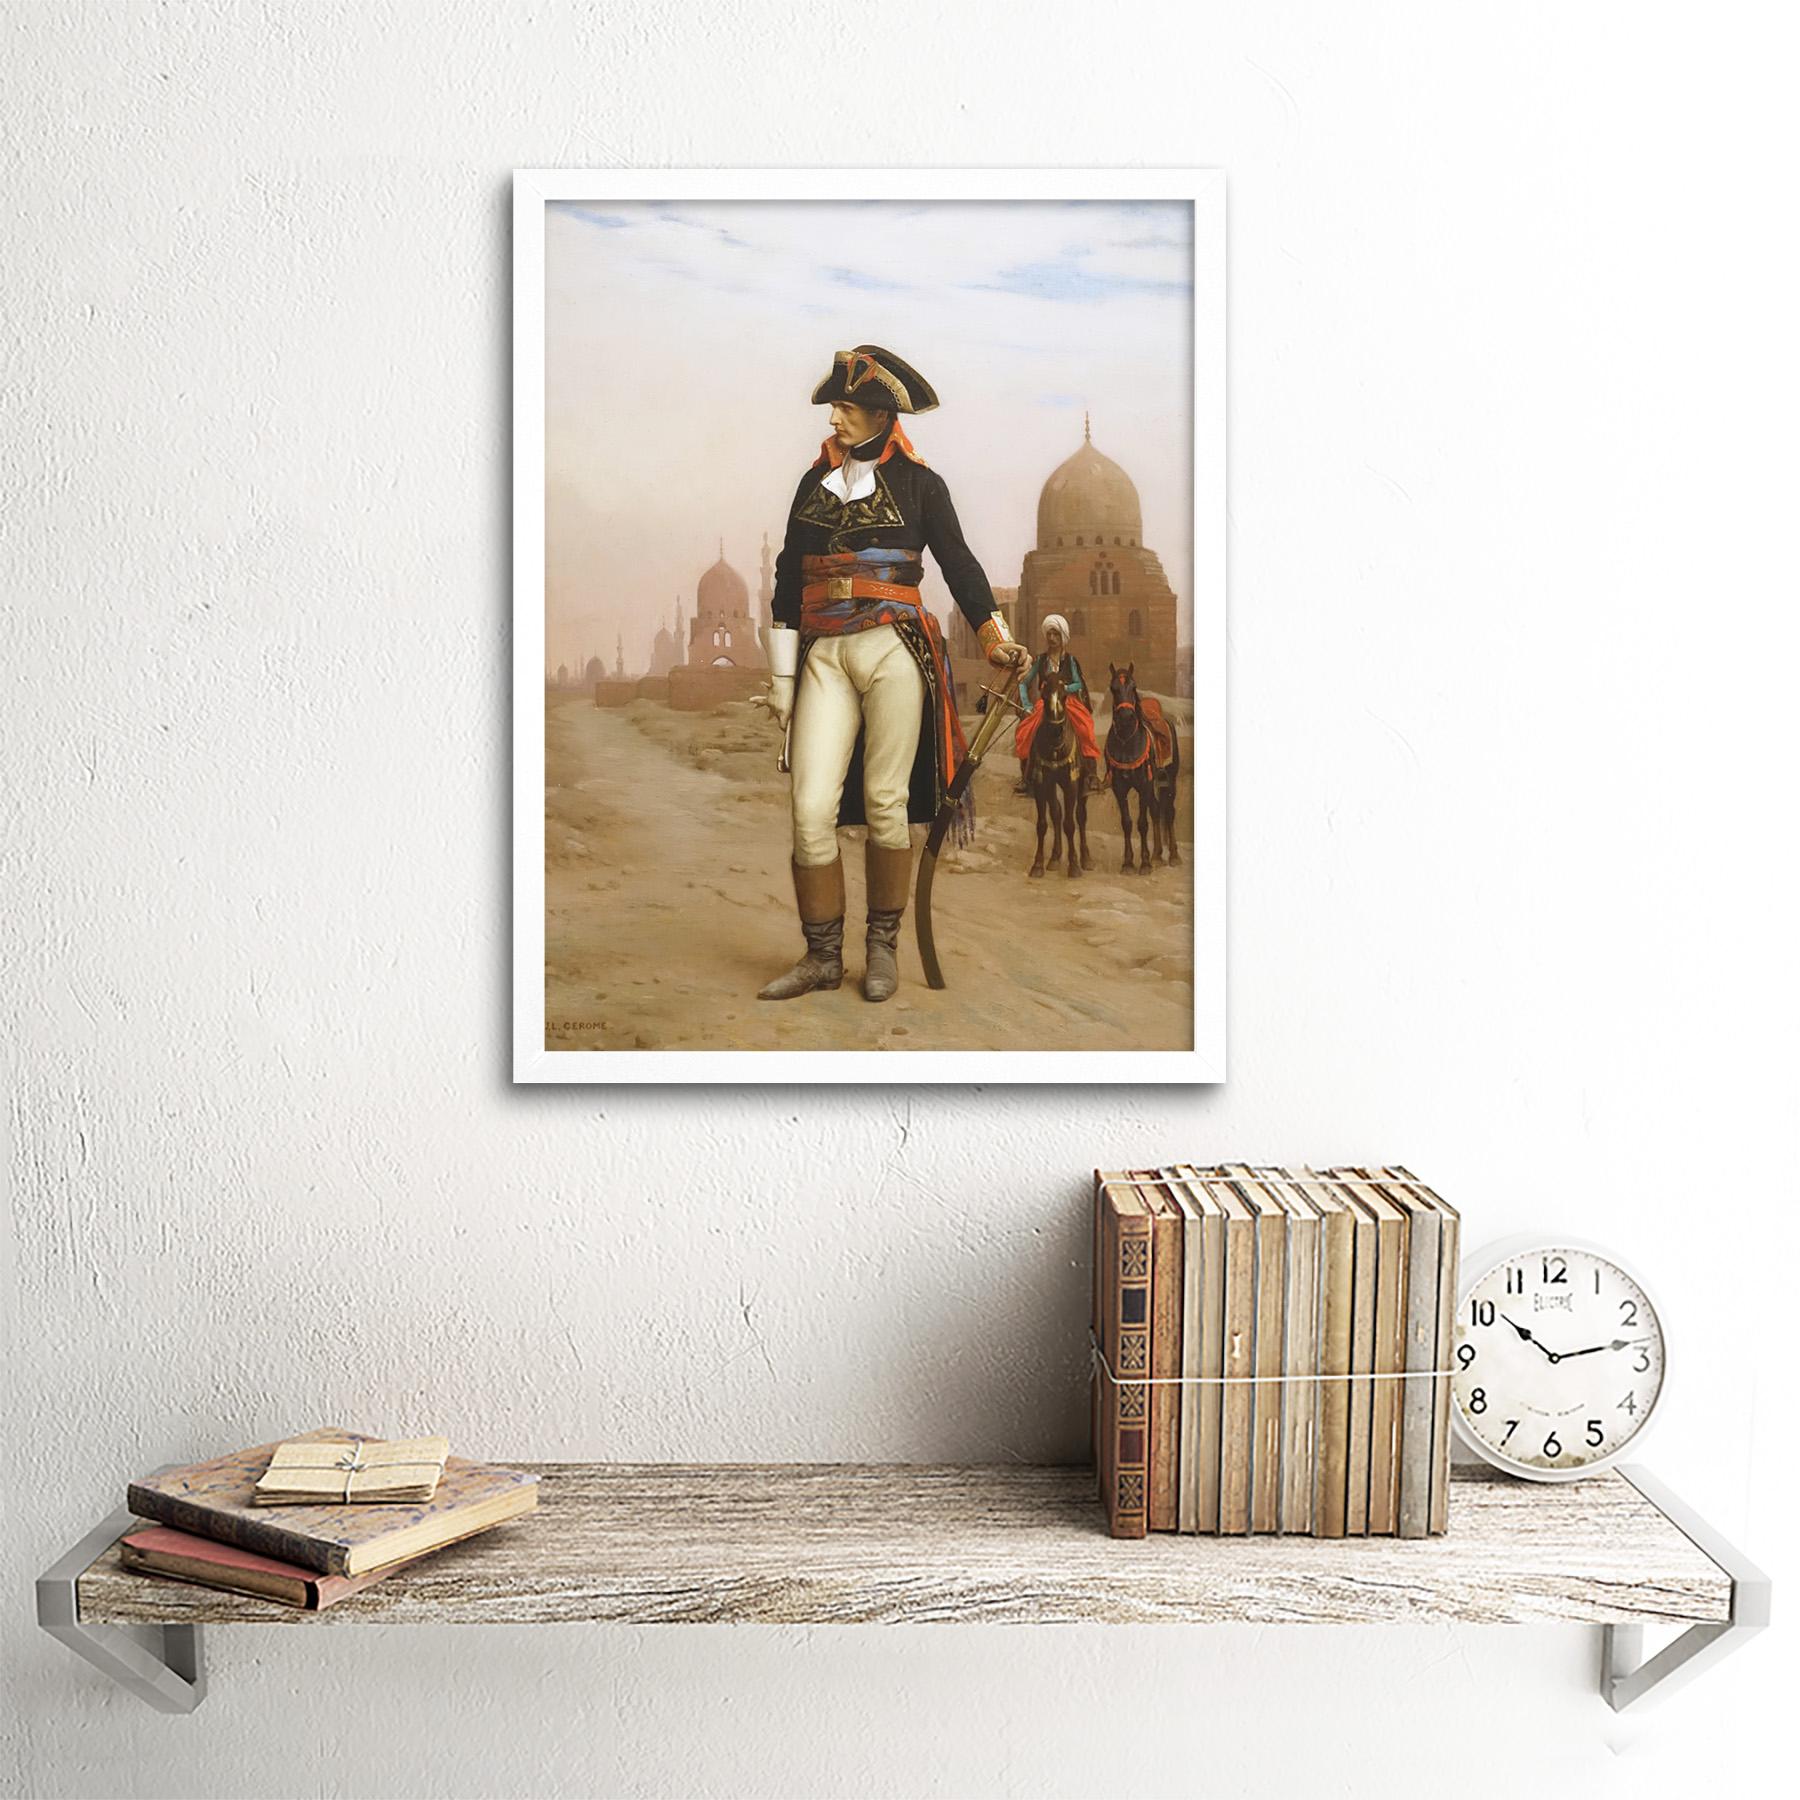 Gerome-Napoleon-Bonaparte-In-Egypt-Painting-Art-Print-Framed-12x16 thumbnail 18